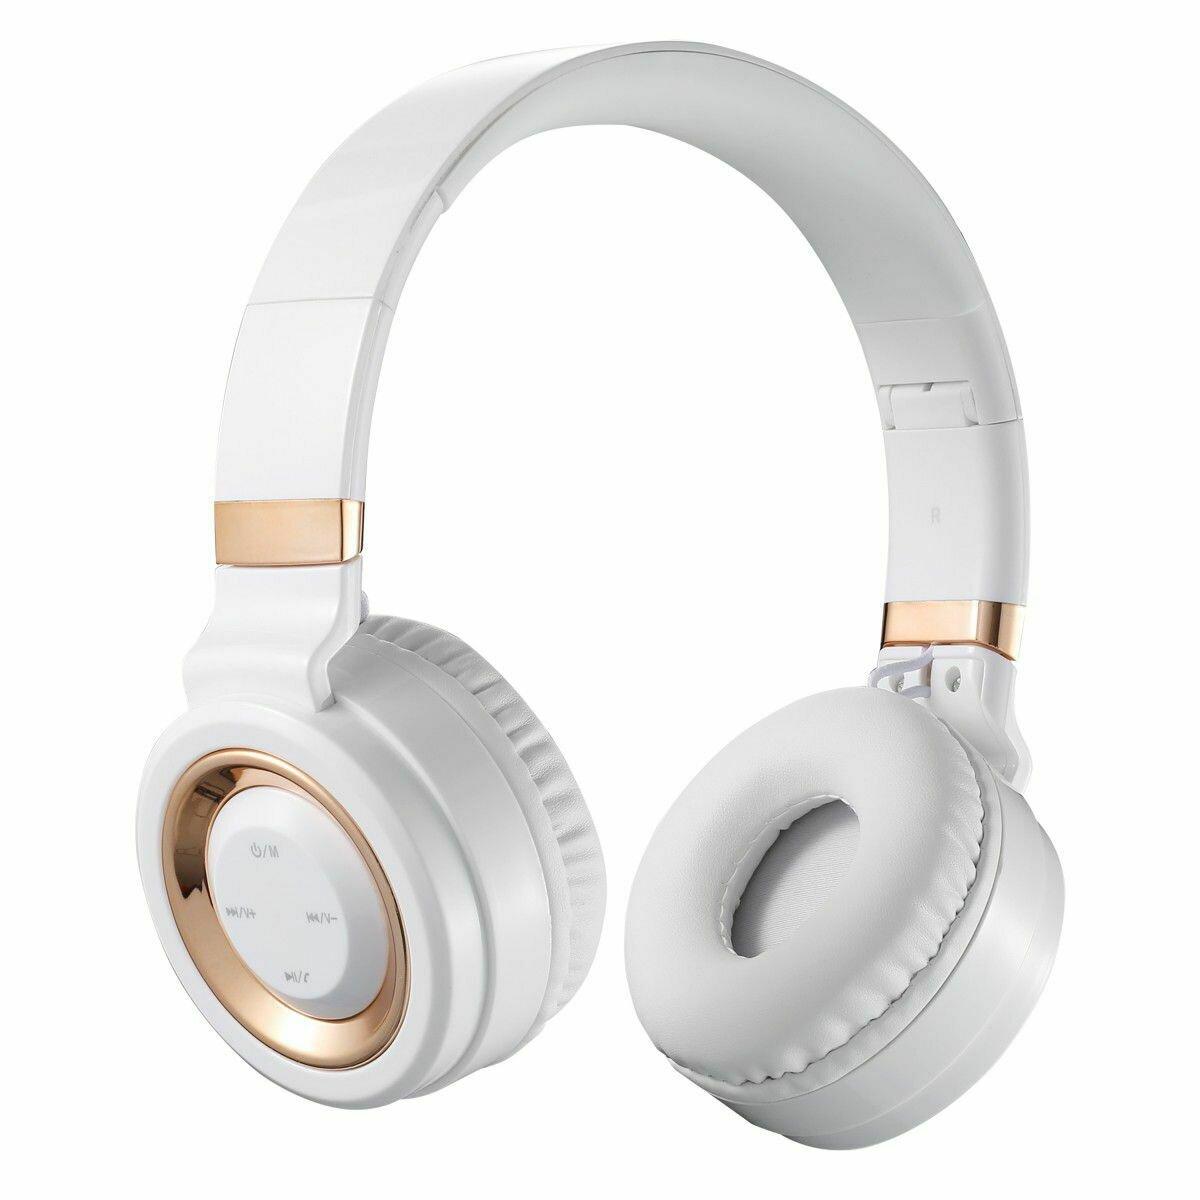 Volkano Lunar series Bluetooth headphones